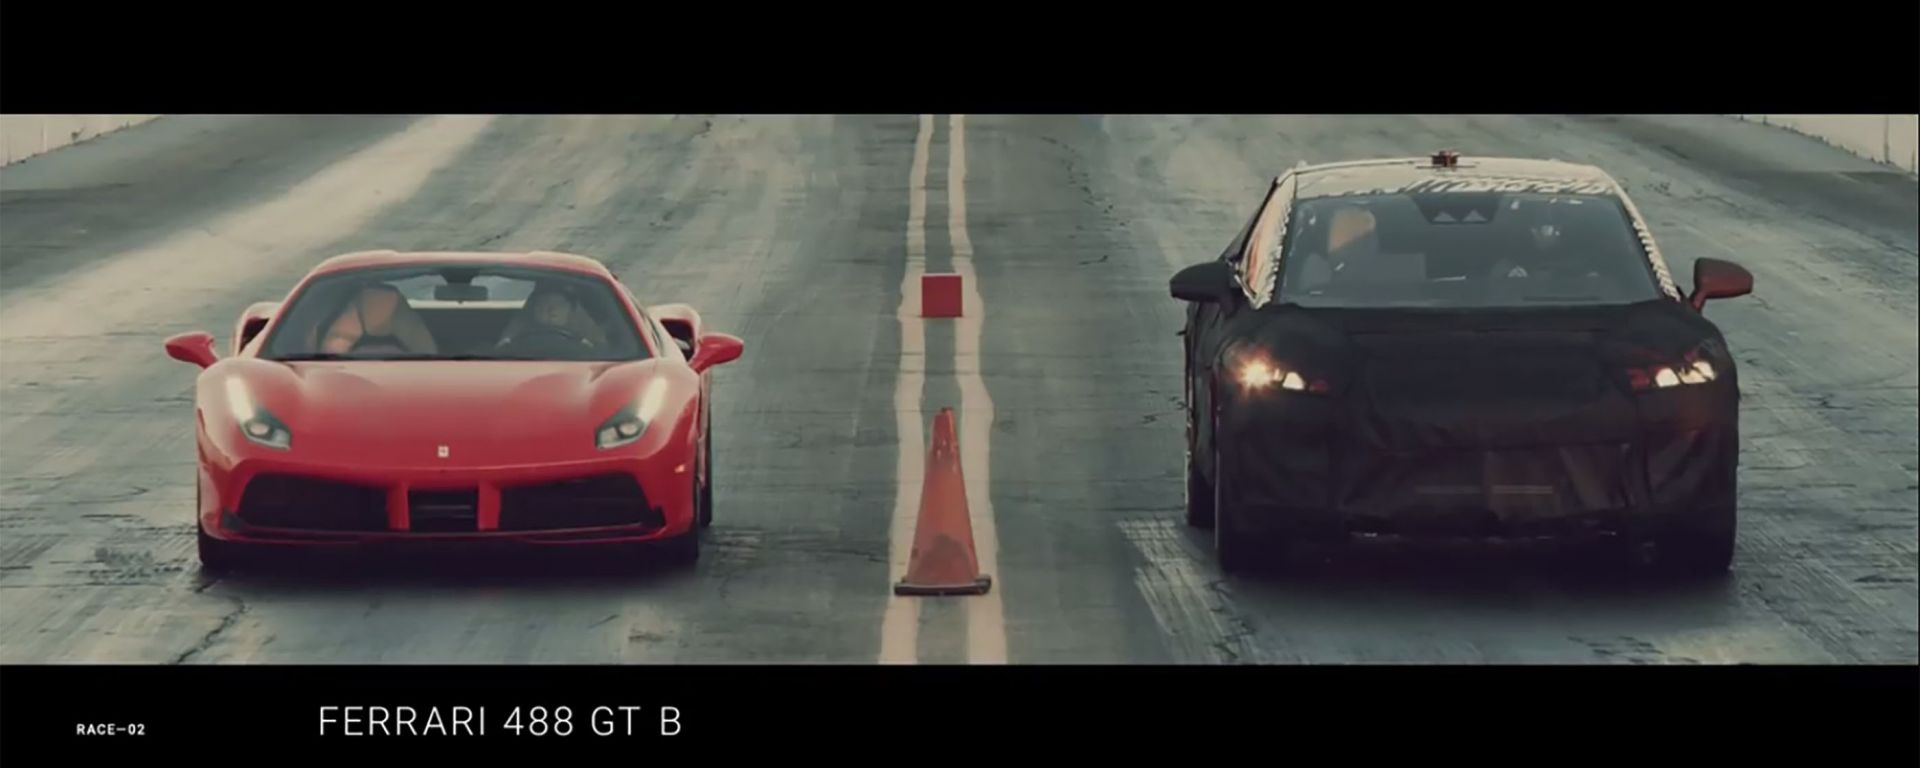 Faraday Future sfida Bentley Bentayga, Ferrari 488 GTB e Tesla Model X in una drag race